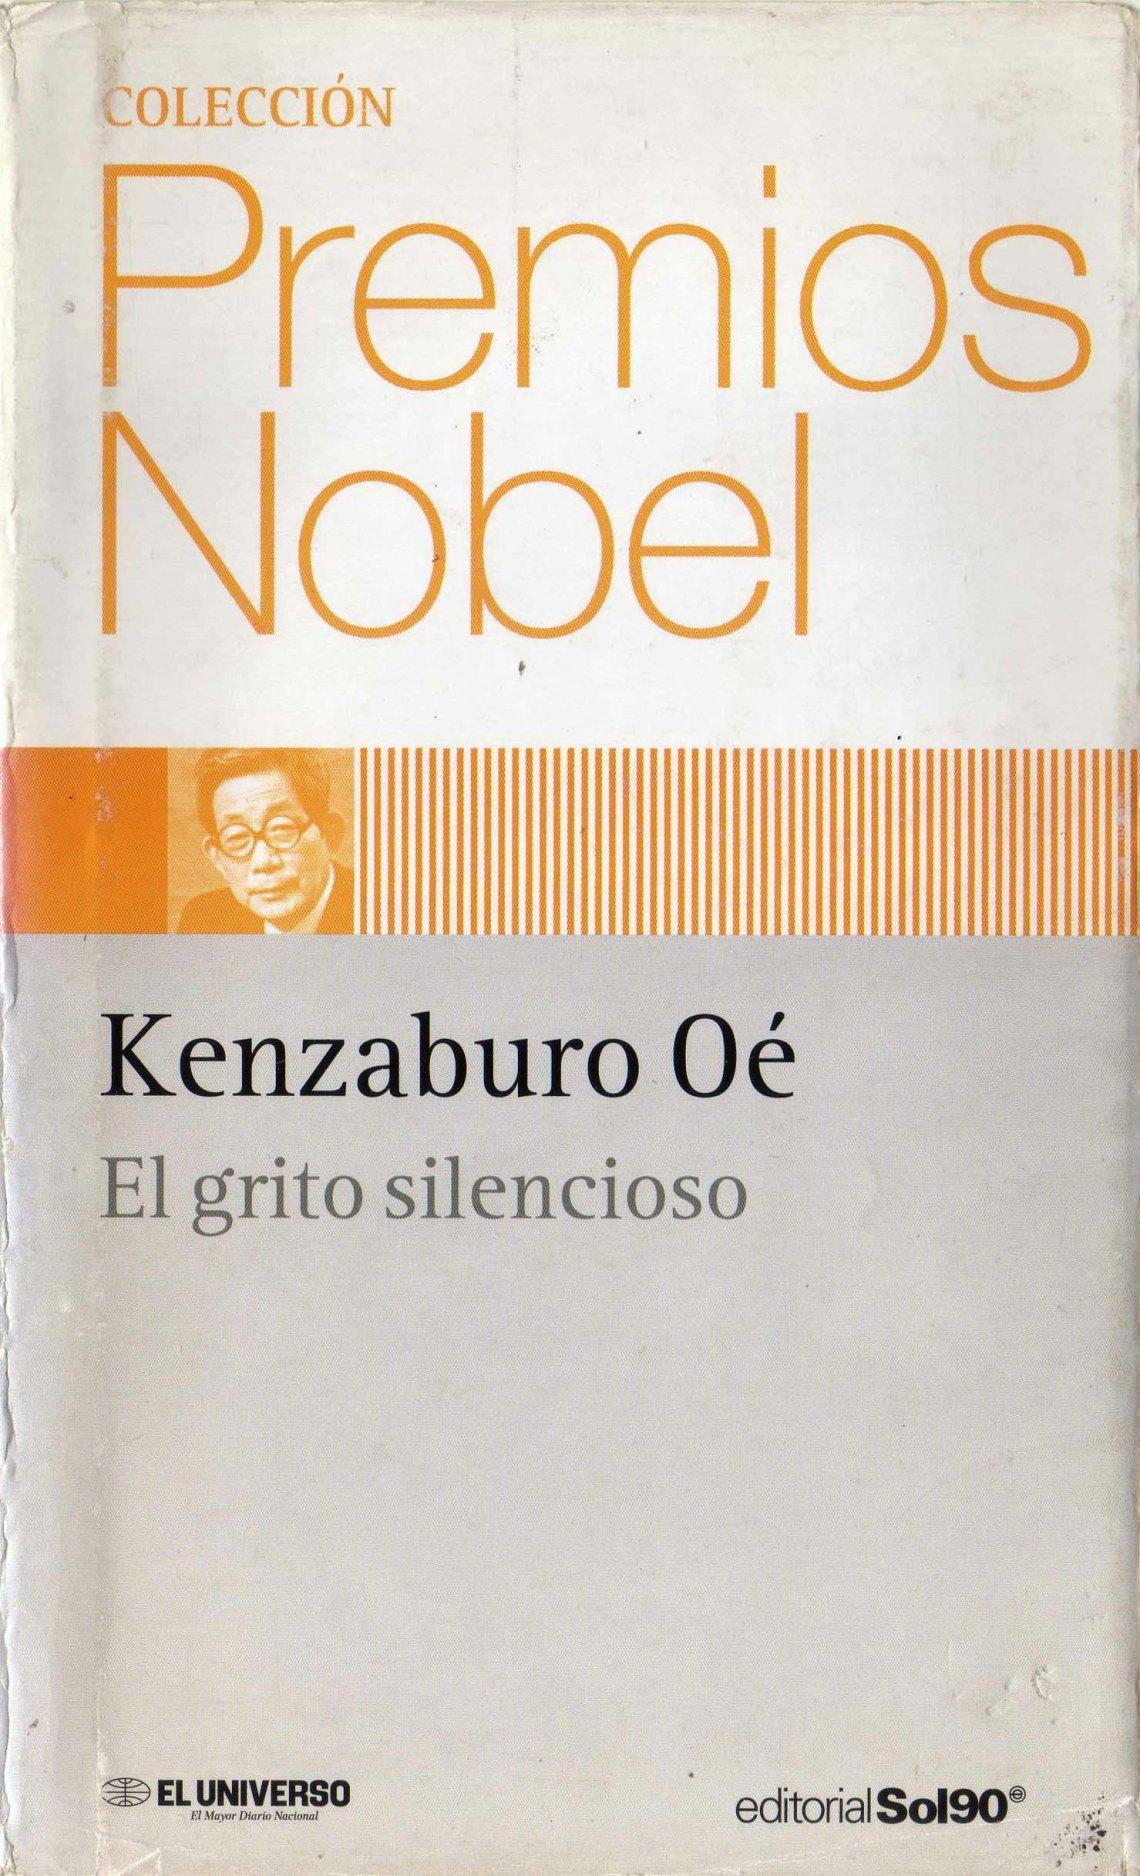 Kenzaburo